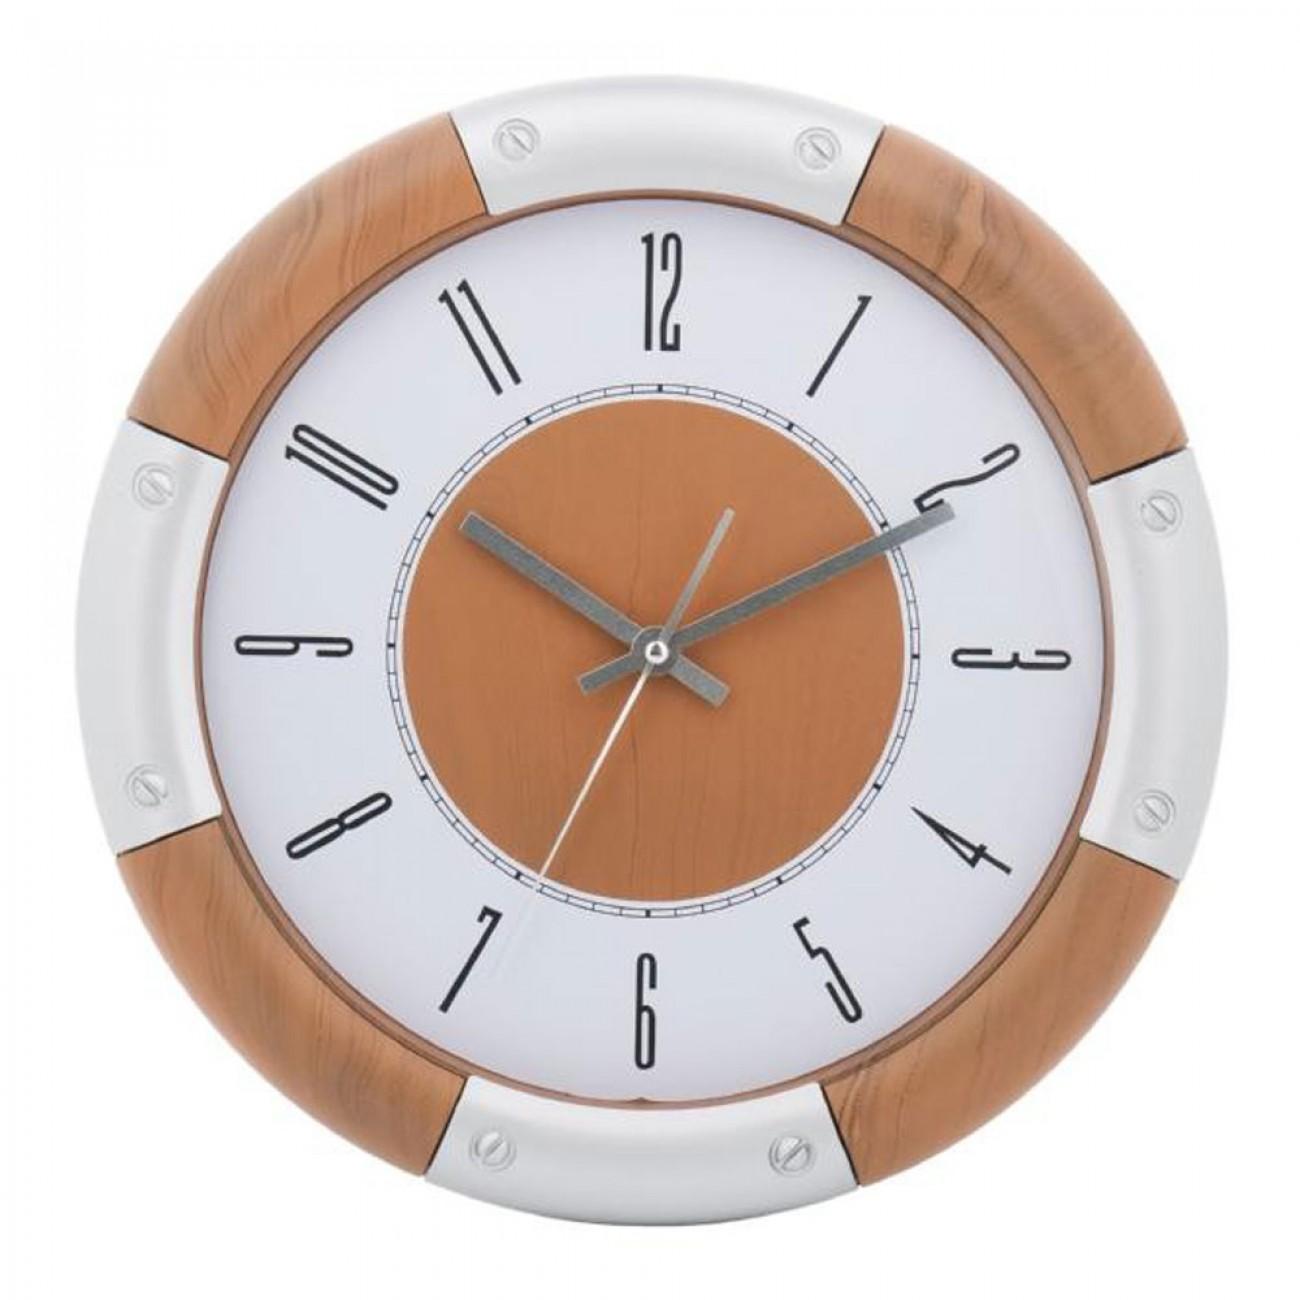 Стенен часовник KingHoff KH 5022, 30 см, Аналогов, Кафяв/бял в Стенни часовници - Kinghoff | Alleop